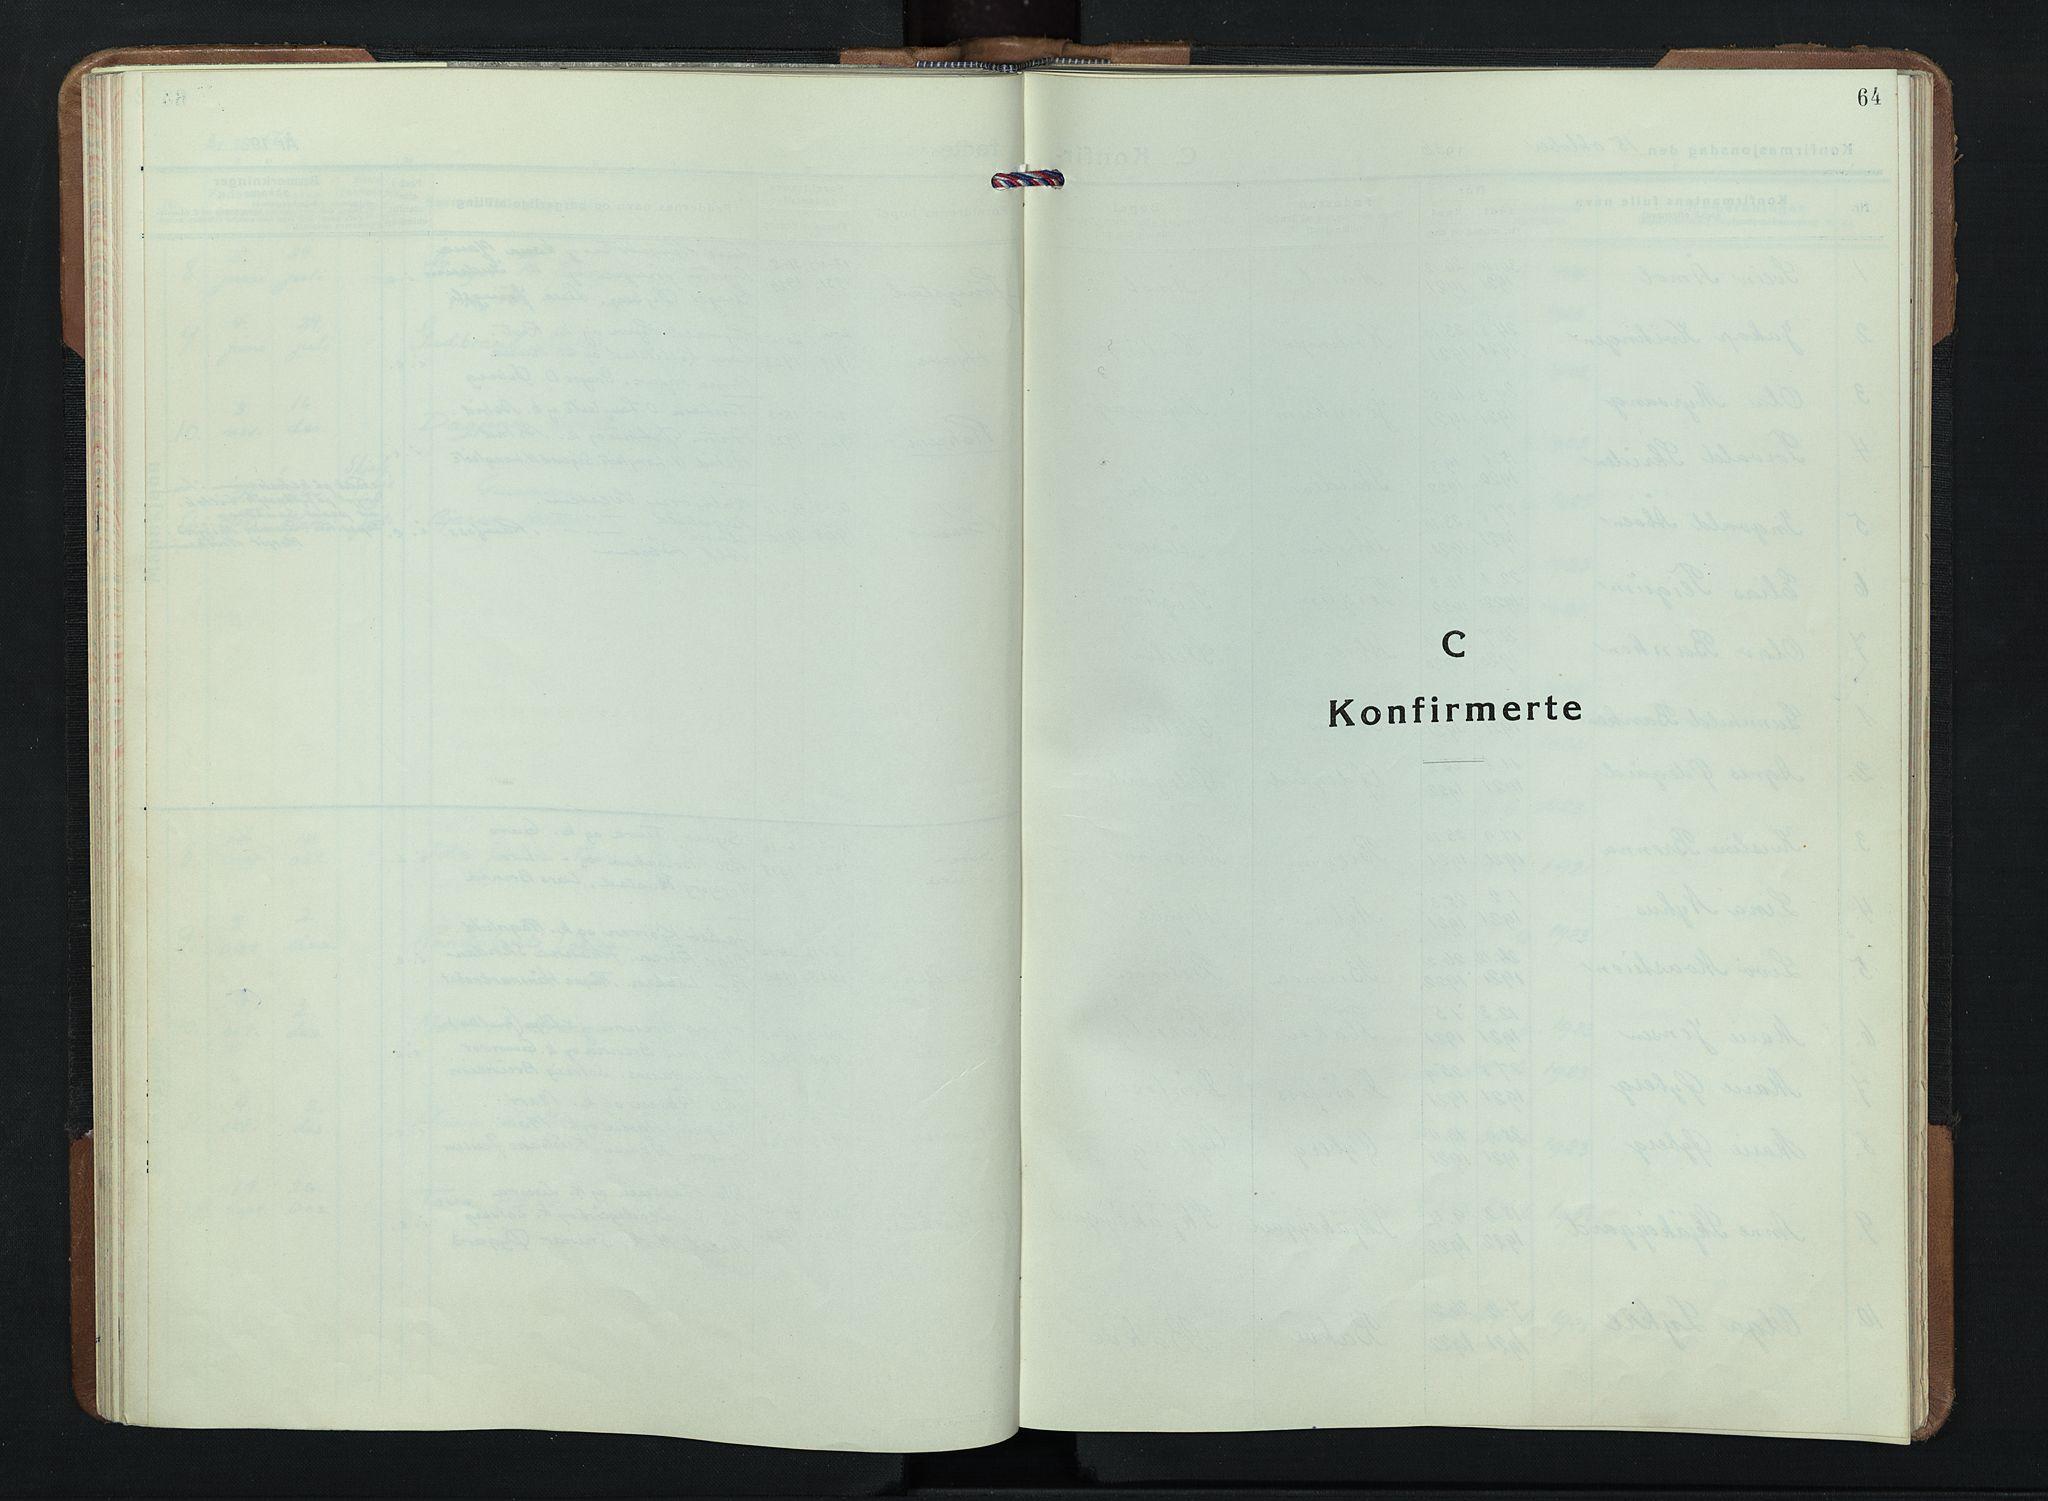 SAH, Skjåk prestekontor, Klokkerbok nr. 7, 1936-1958, s. 64